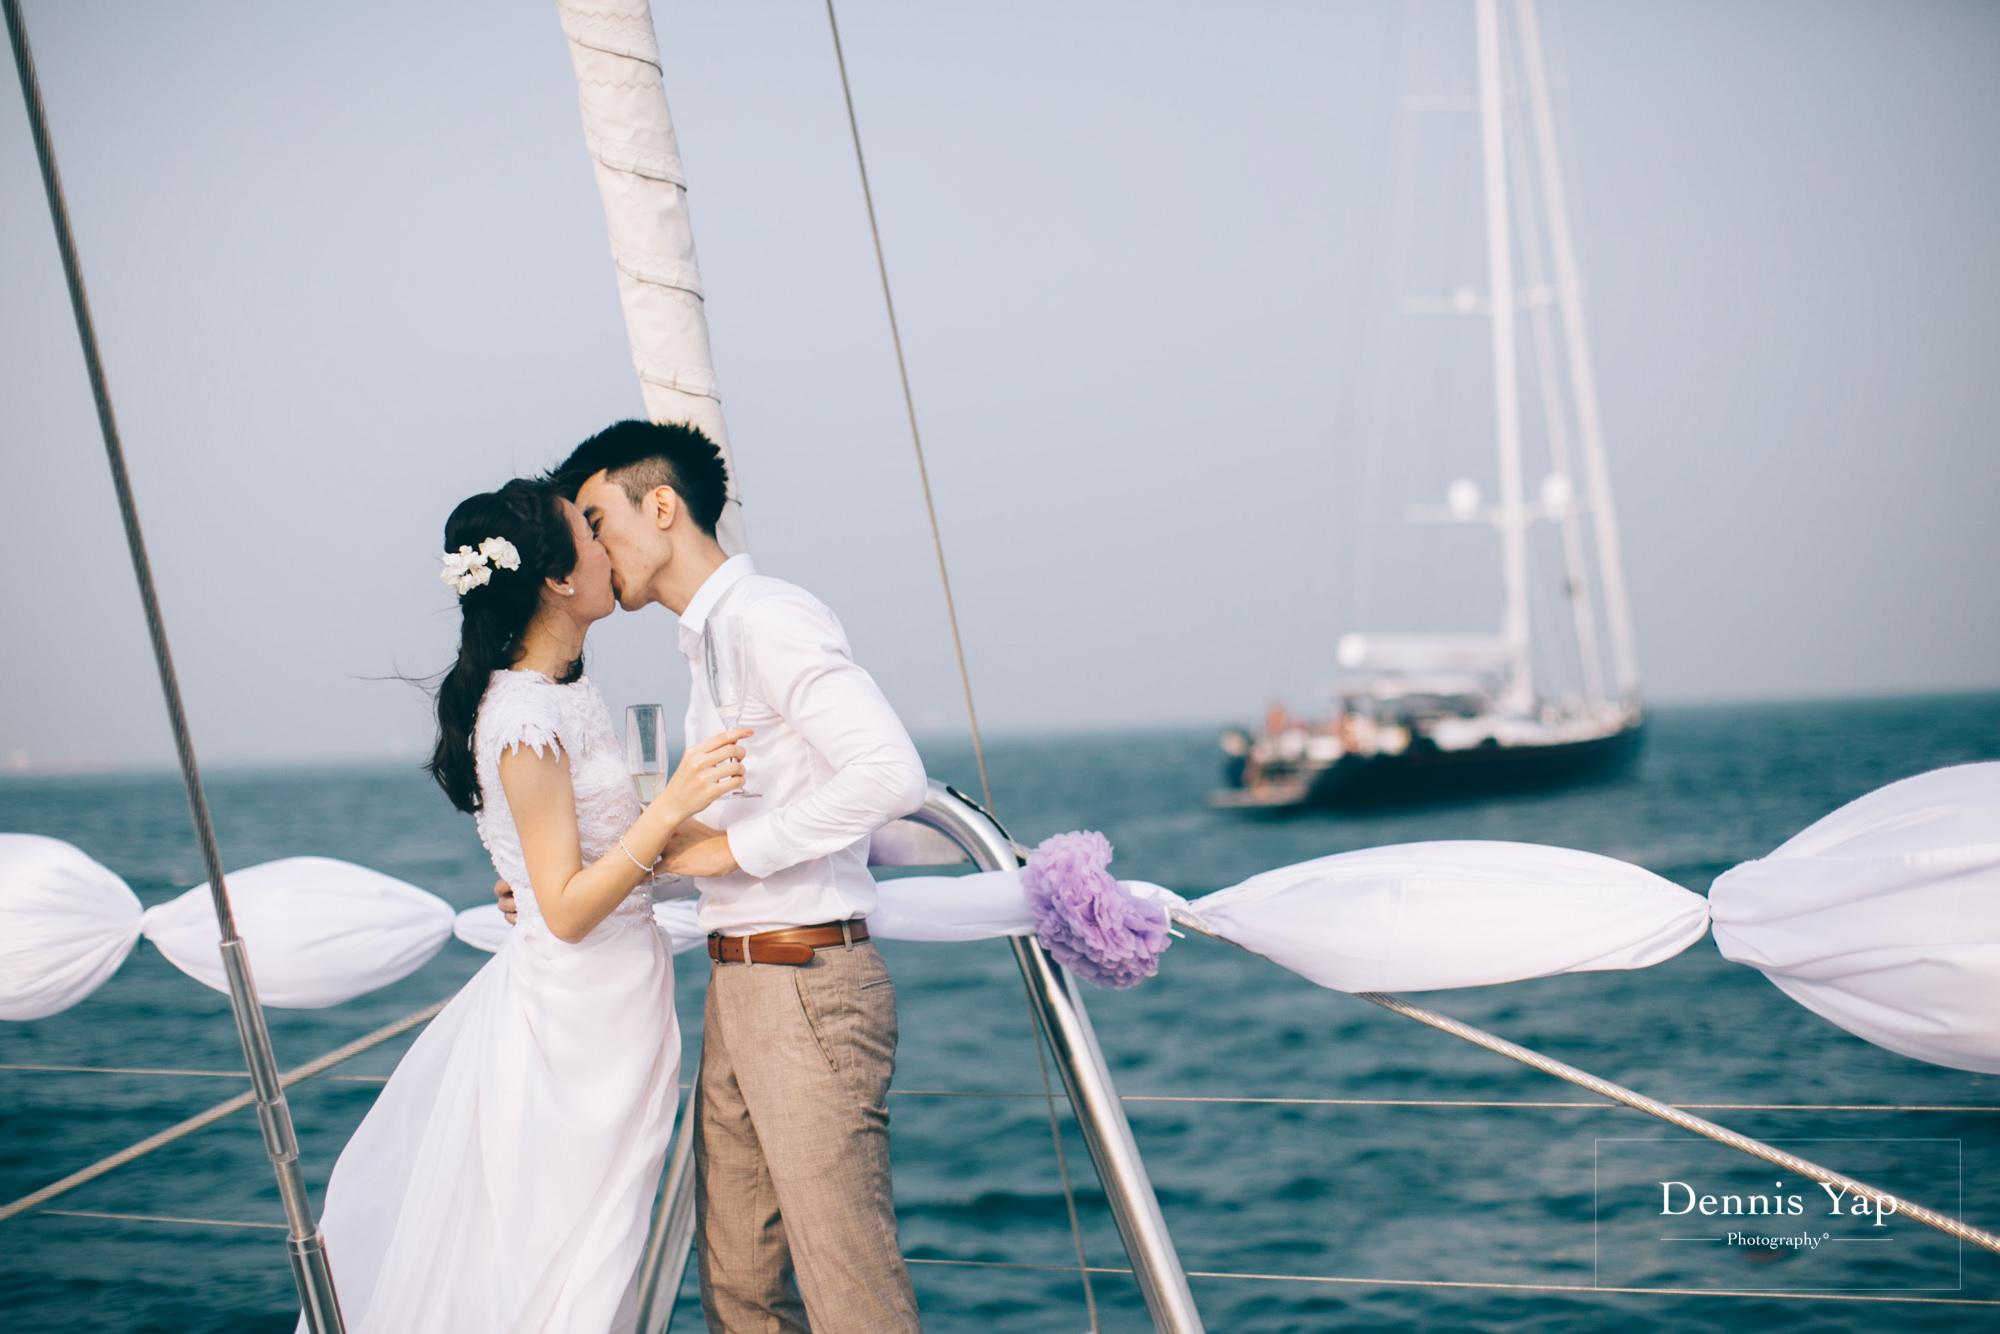 danny sherine wedding reception registration of marriage yacht fun beloved sea dennis yap photography malaysia top wedding photographer-35.jpg